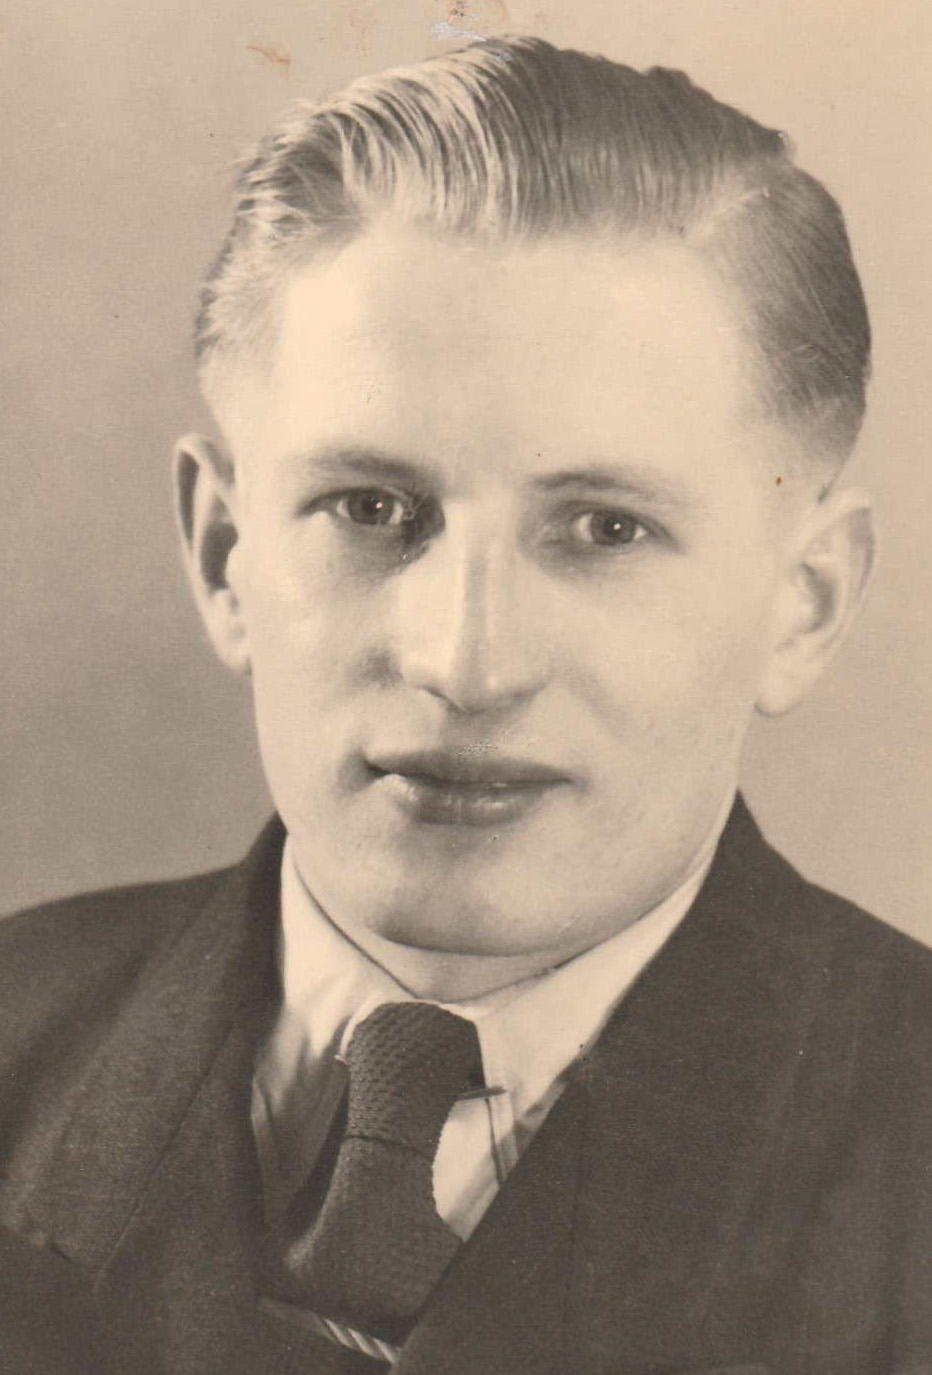 Heinz Wese portrait